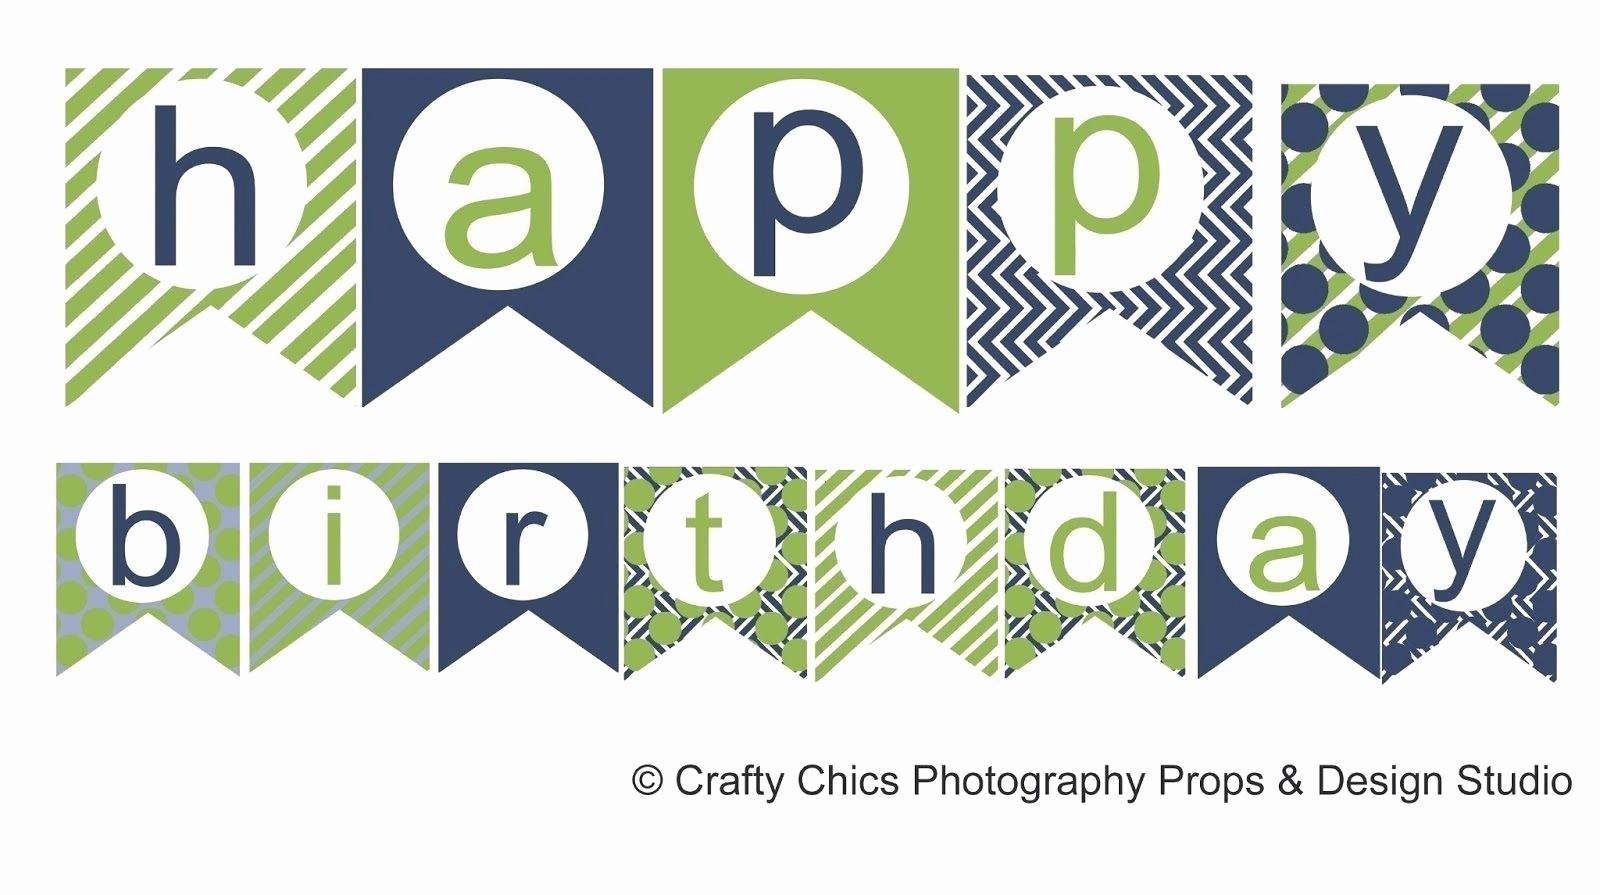 Happy Birthday Banner Template Printable Beautiful Happy Birthday Banner Template Printable